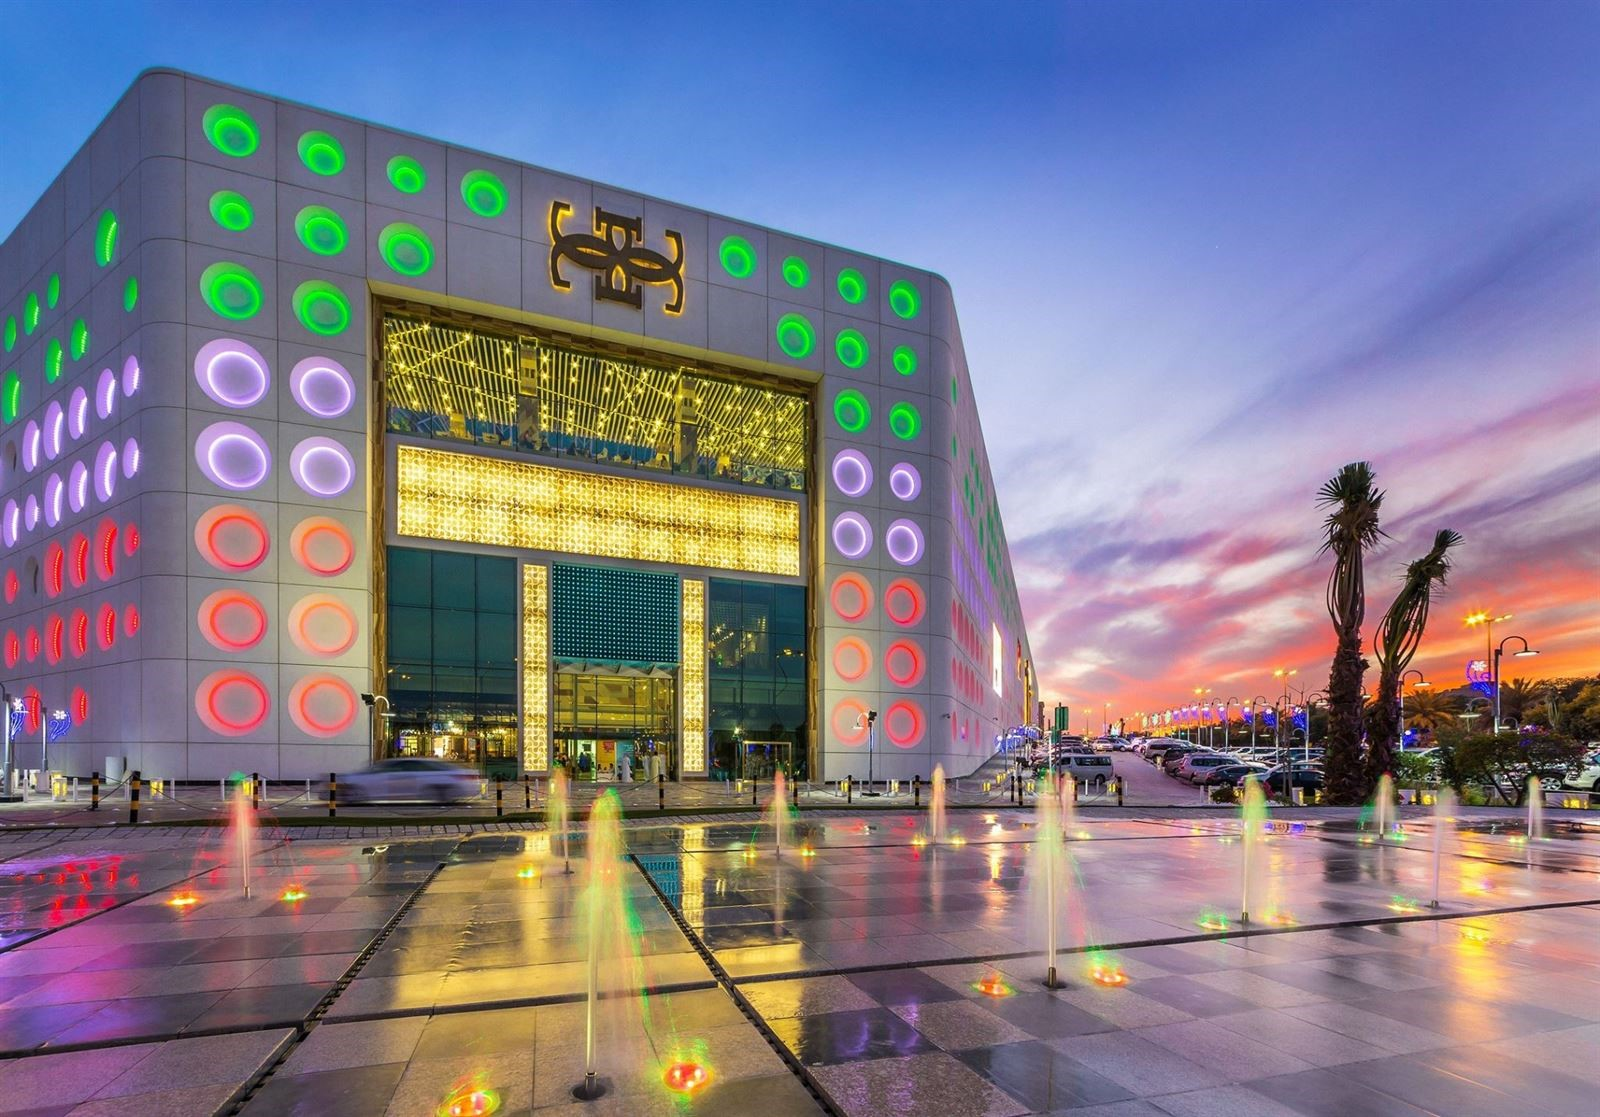 d2b559e0c ذا جيت مول.. أكبر مهرجان تسوق في الكويت   دليل الكويت السياحي